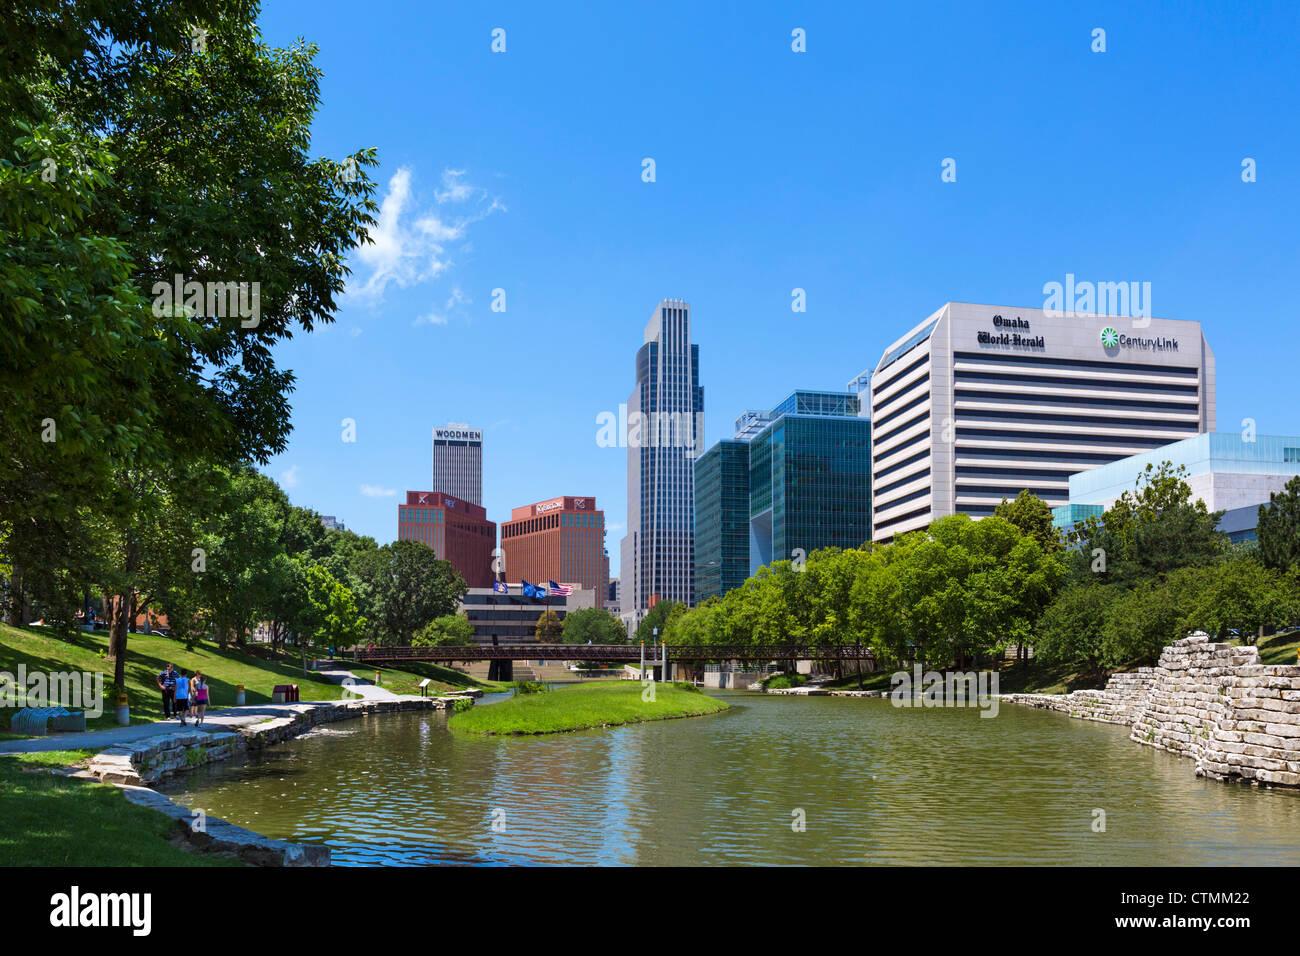 The city skyline from Gene Leahy Mall (also known as Central Park), Omaha, Nebraska, USA Stock Photo